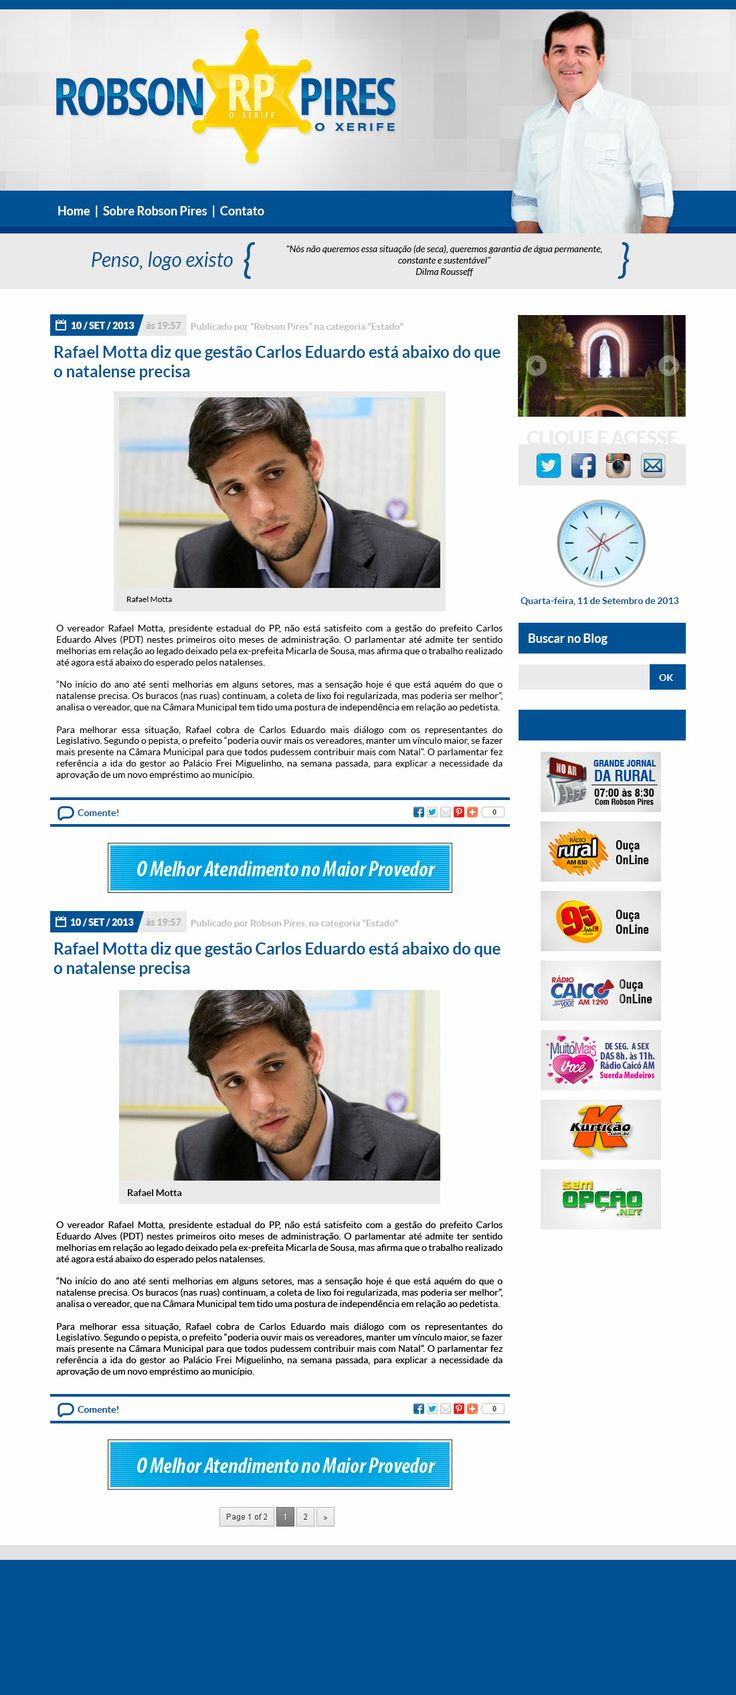 Blog de Robson Pires (www.robsonpiresxerife.com)